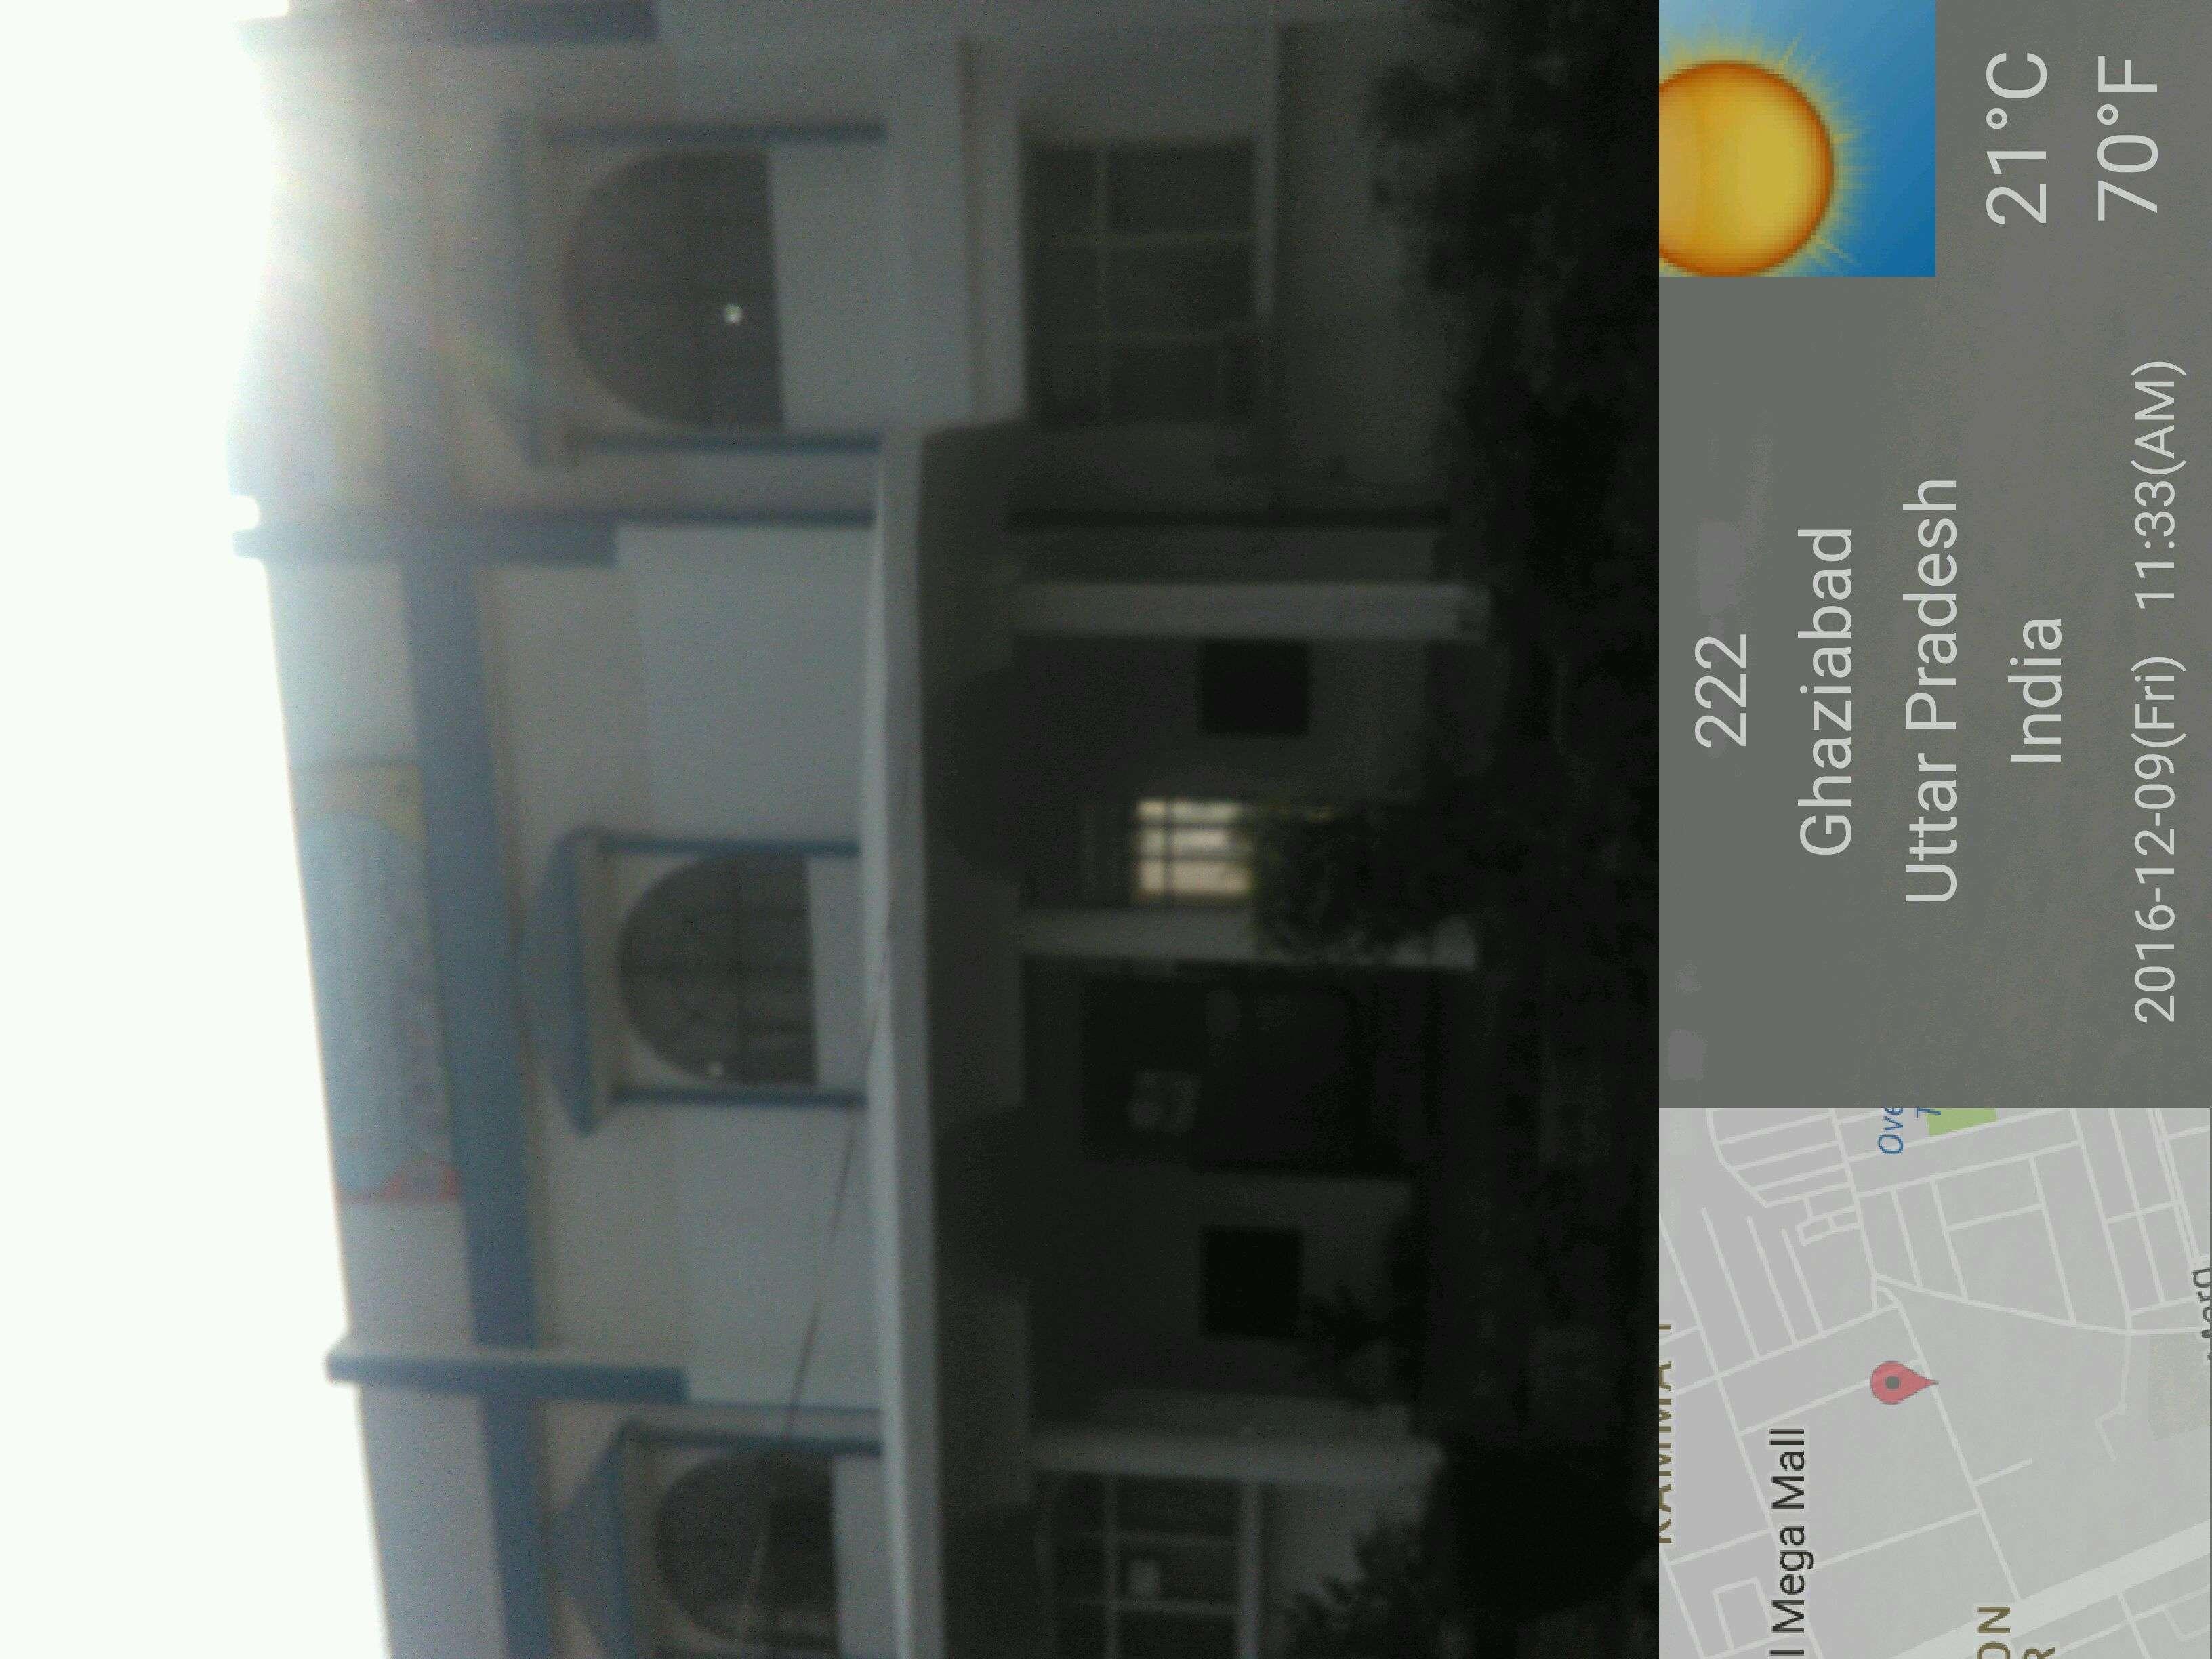 POLICE MODERN SCHOOL 41 BATALLION PAC GHAZIABAD UTTAR PRADESH 2130467